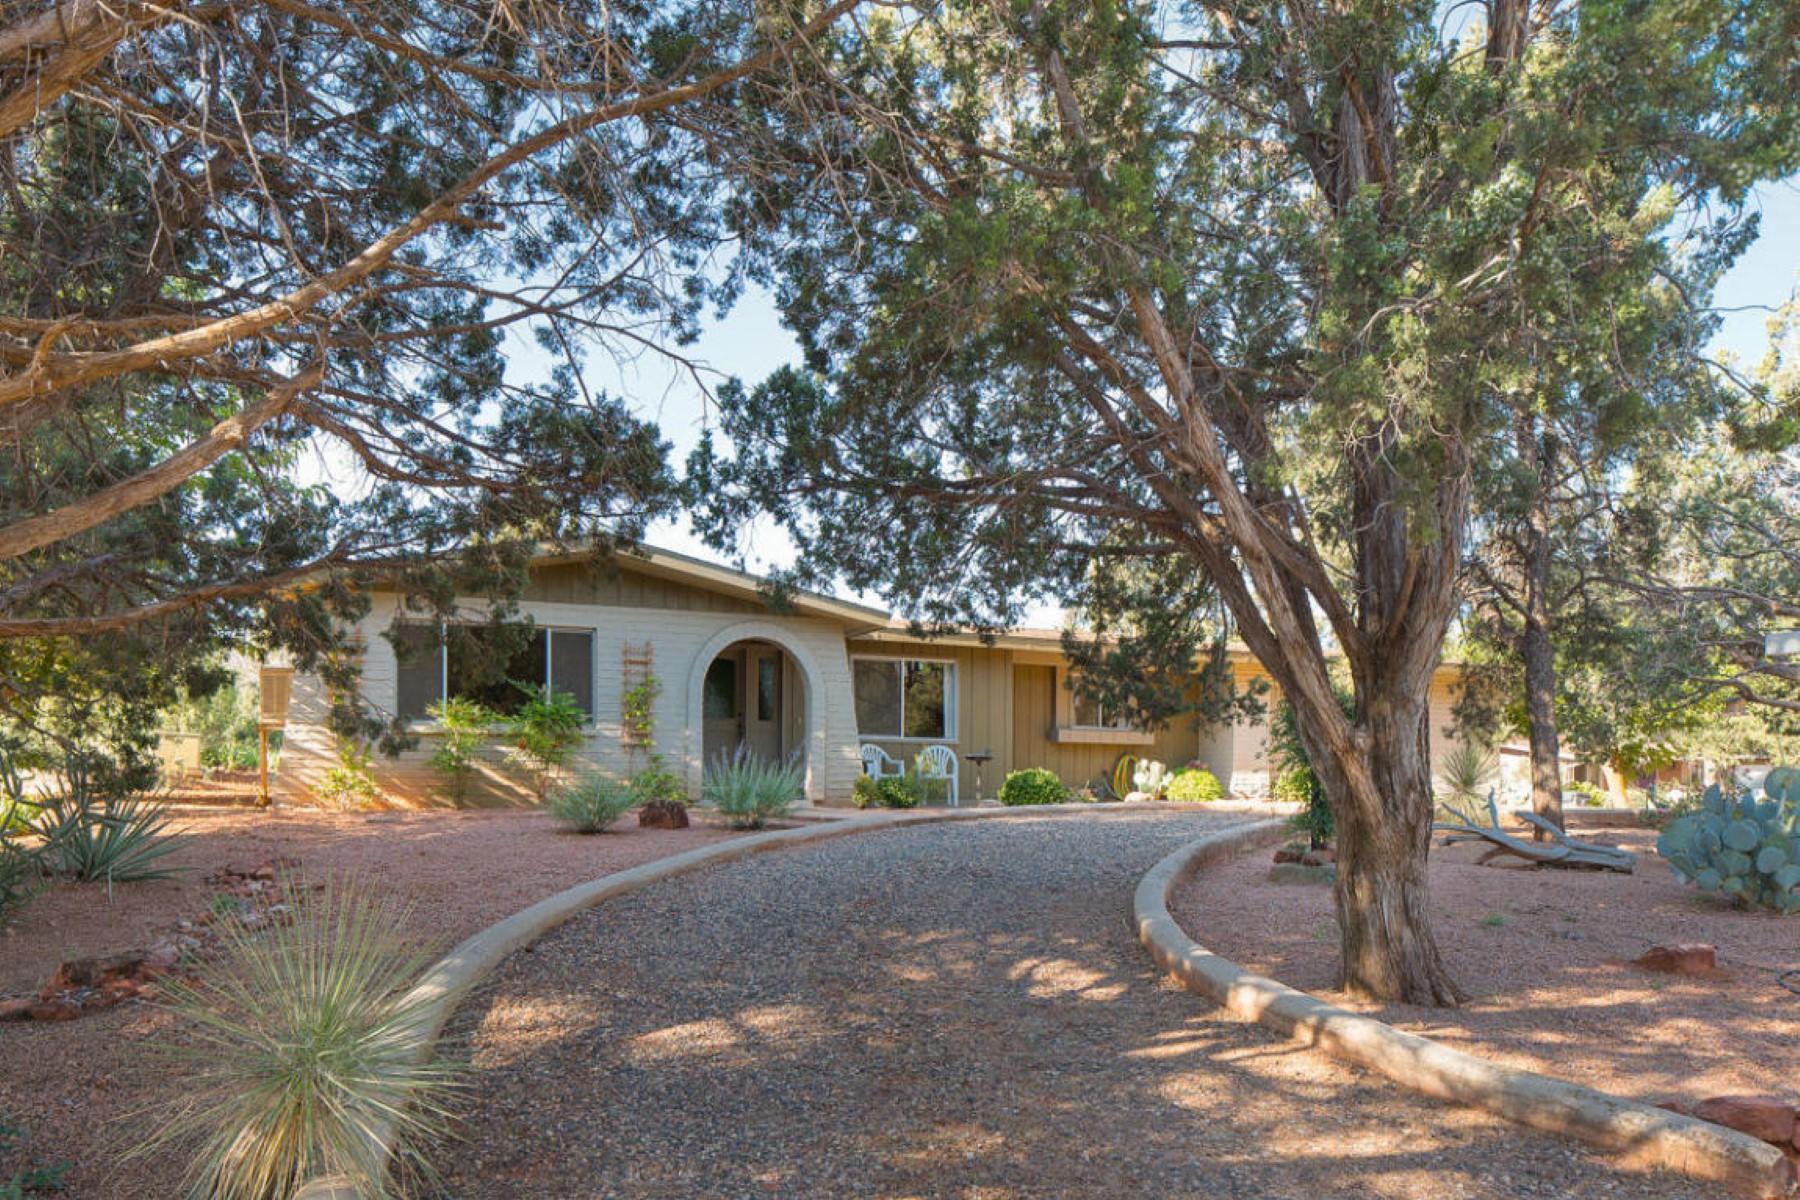 Nhà ở một gia đình vì Bán tại Solidly built and lovingly cared for home in great location. 80 Canyon Wren Drive Sedona, Arizona 86336 Hoa Kỳ